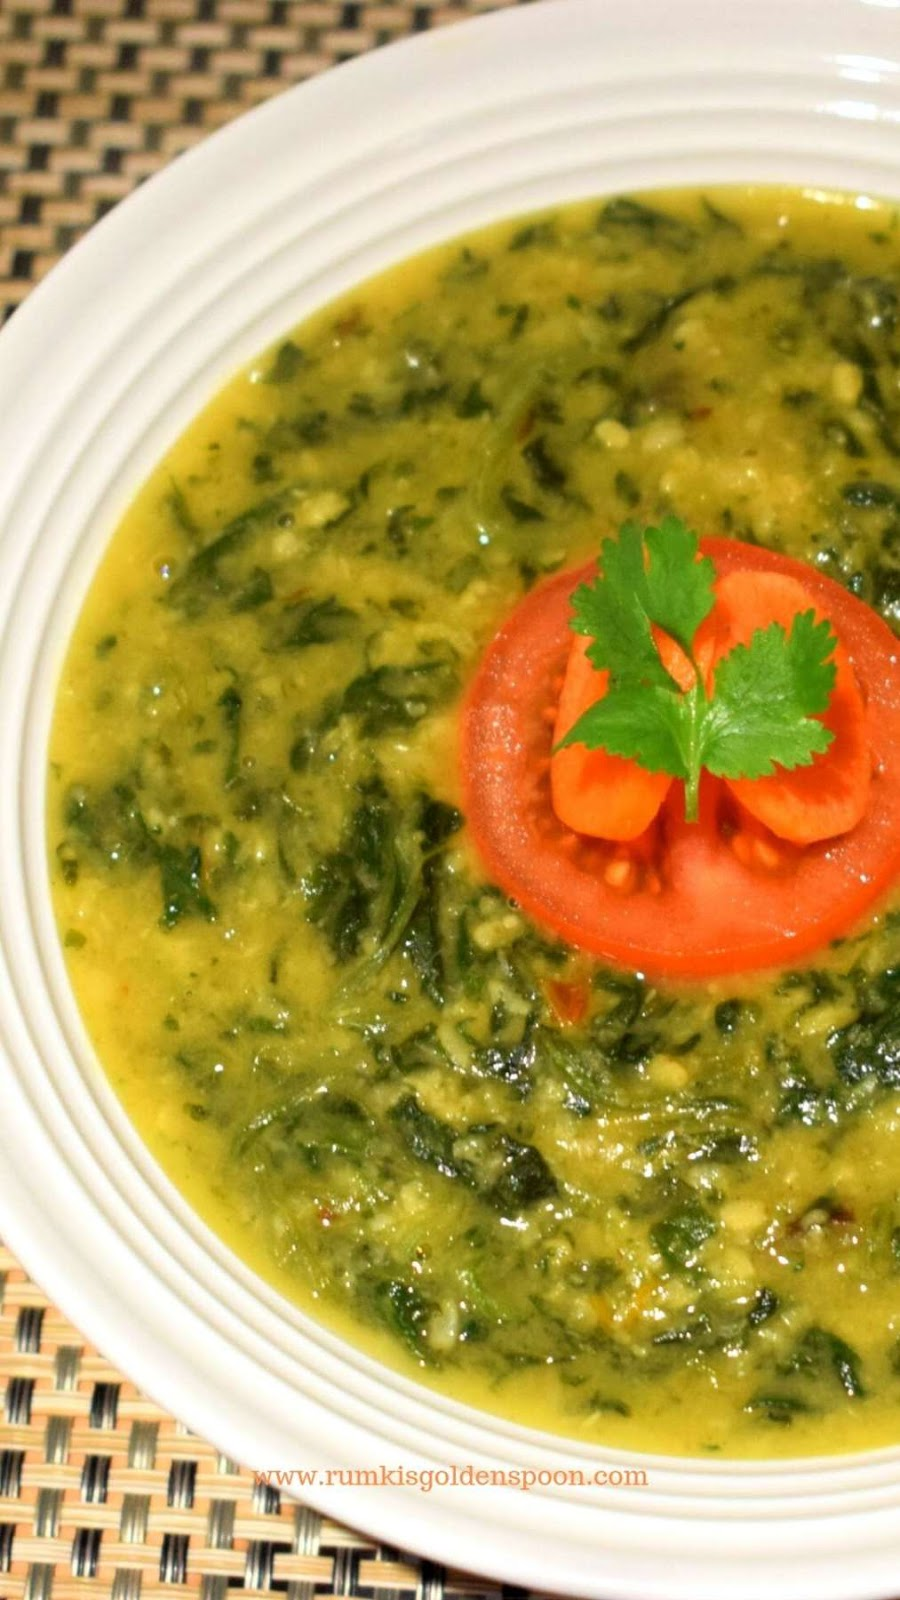 Moong dal palak, palak moong dal, spinach dal, indian dahl with spinach, dahl recipe, dal recipe, palak with dal, dal palak, dal palak recipe, Moong dal palak recipe, palak dal, palak recipes, spinach recipes Indian, moong dal recipe, Rumki's Golden Spoon